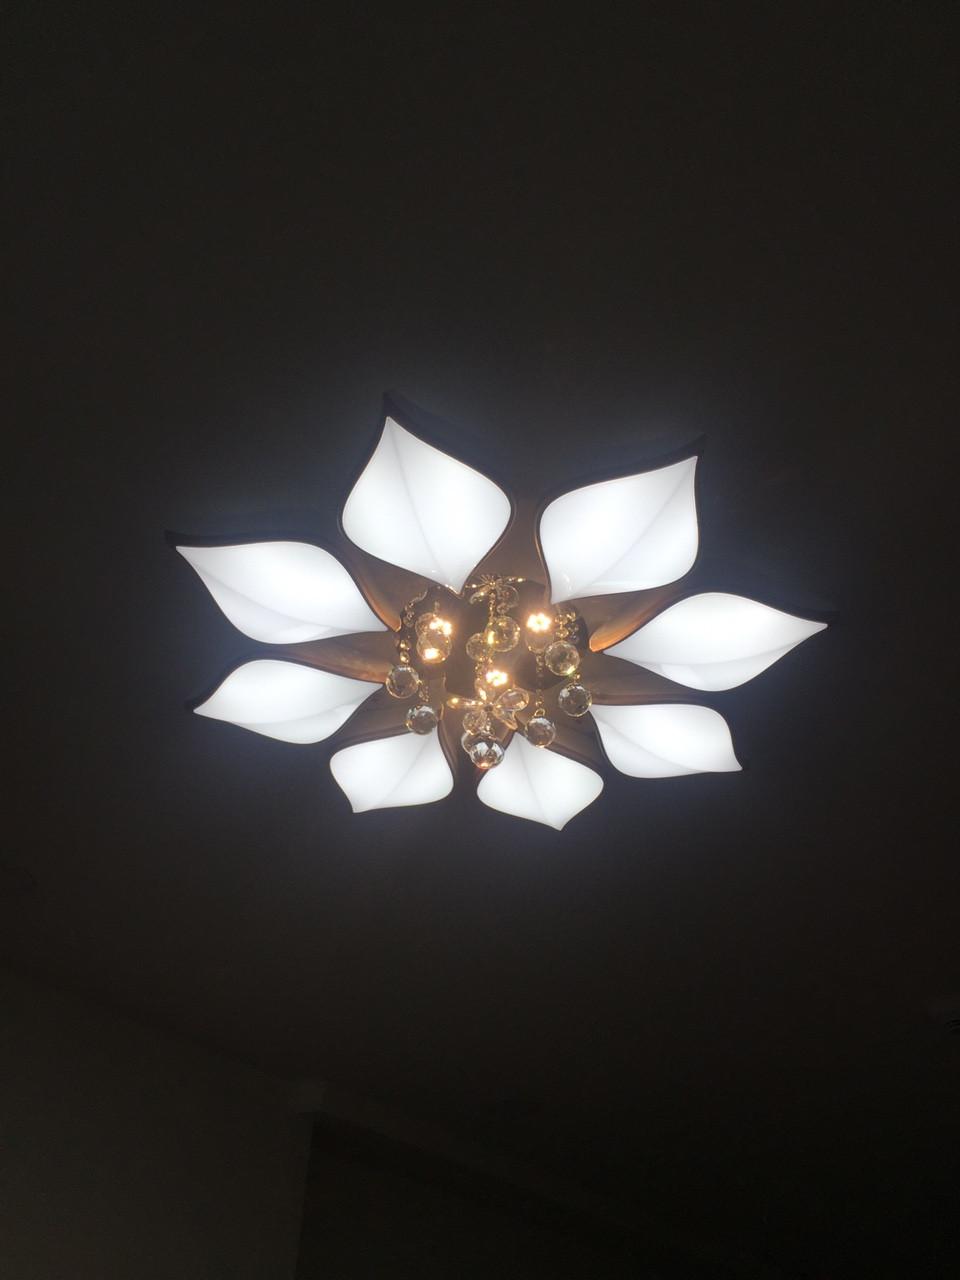 Đèn ốp trần cánh hoa pha lê HTOP-09